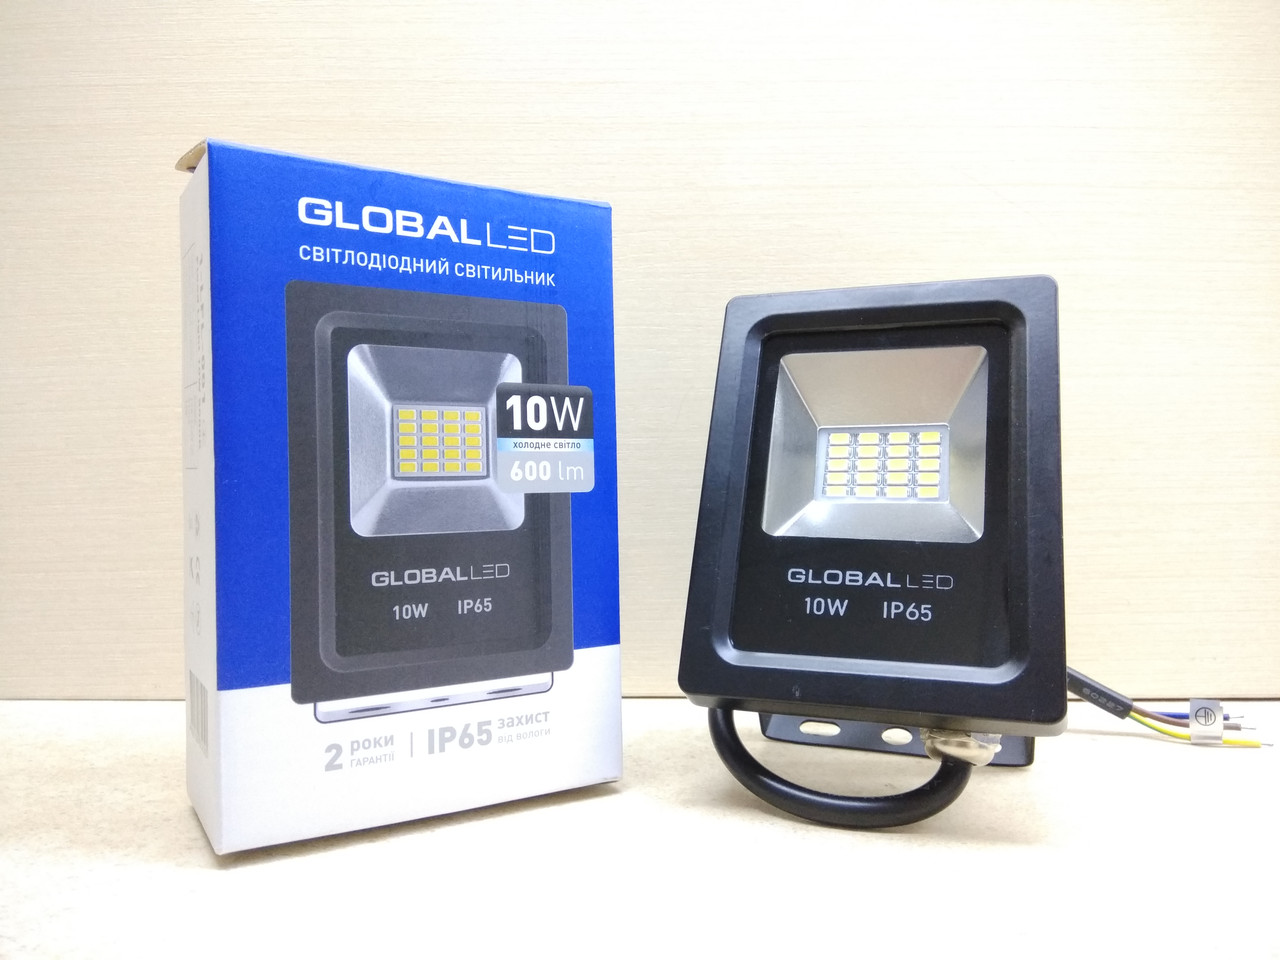 Светодиодный прожектор LED GLOBAL FLOOD LIGHT 10W 5000K ІР65 (1-LFL-001)